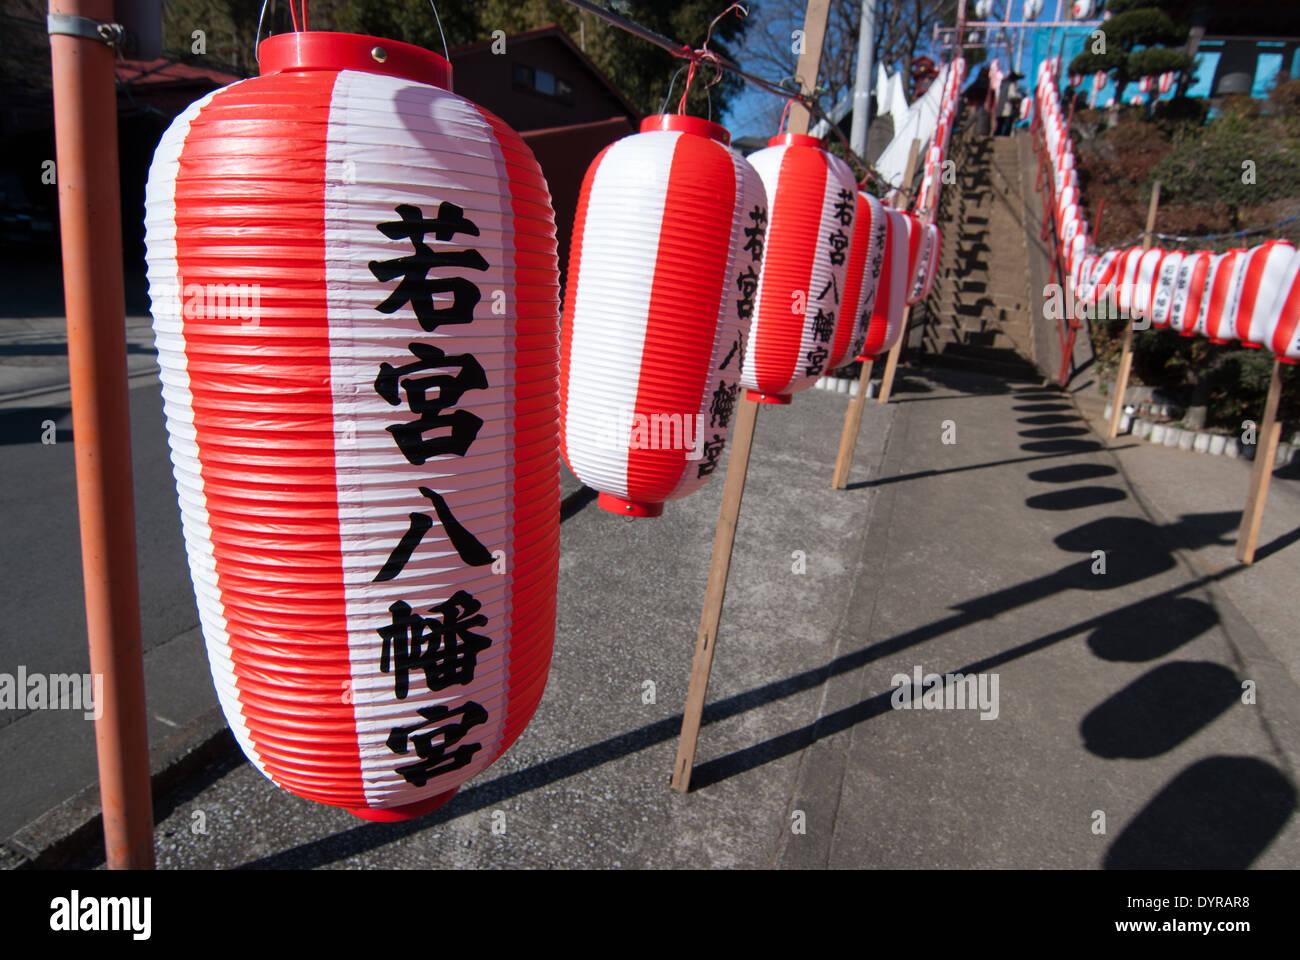 Paper Lanterns, Yamato, Kanagawa Prefecture, Japan - Stock Image